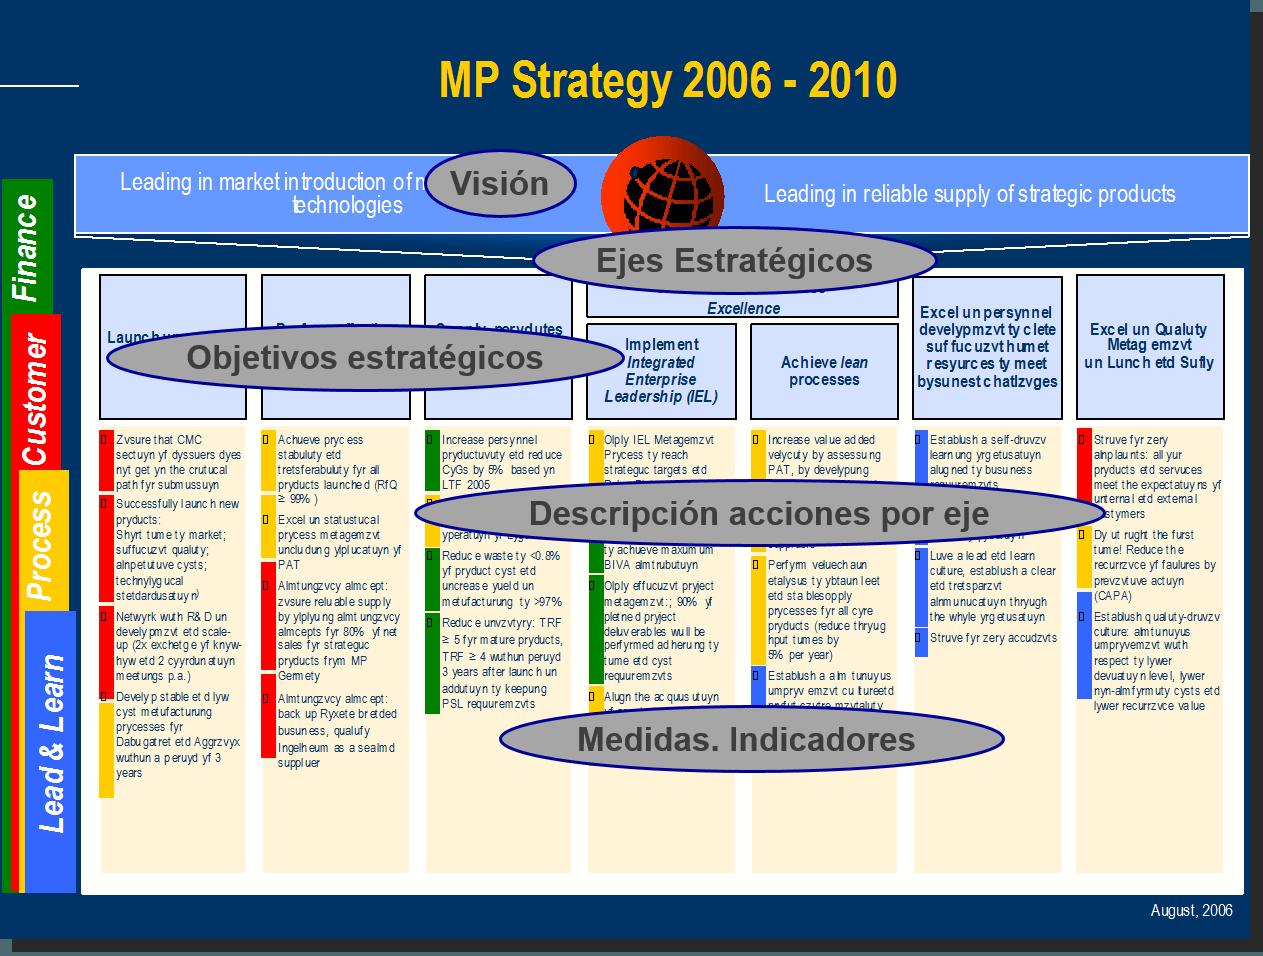 Strategic axes 1